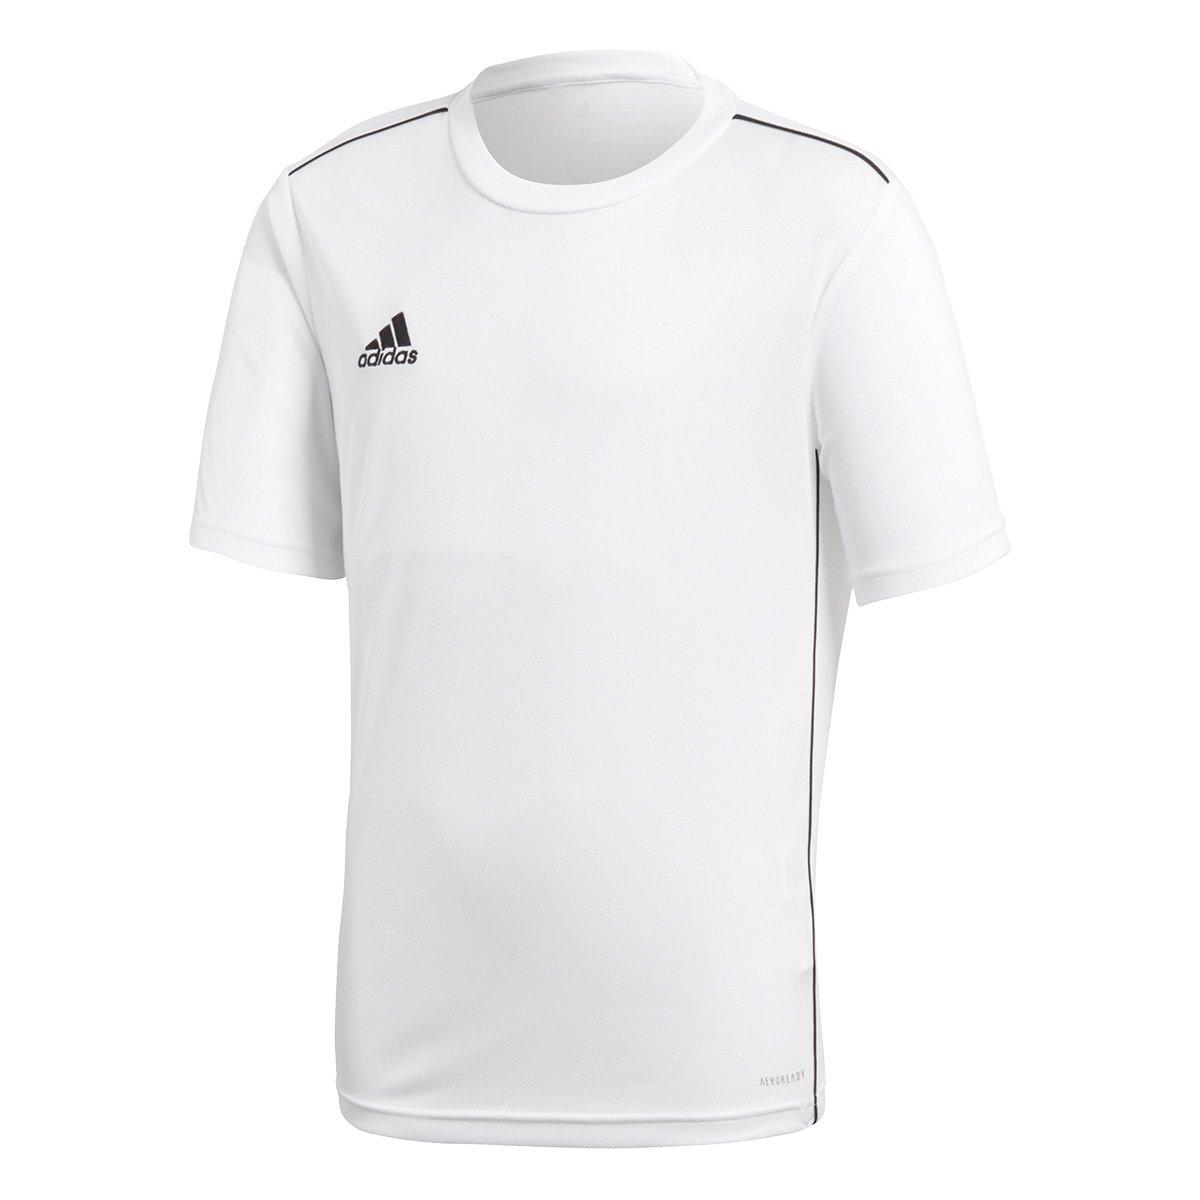 701da0755aa Camiseta Infantil Adidas Core 18 - Branco e Preto - Compre Agora ...